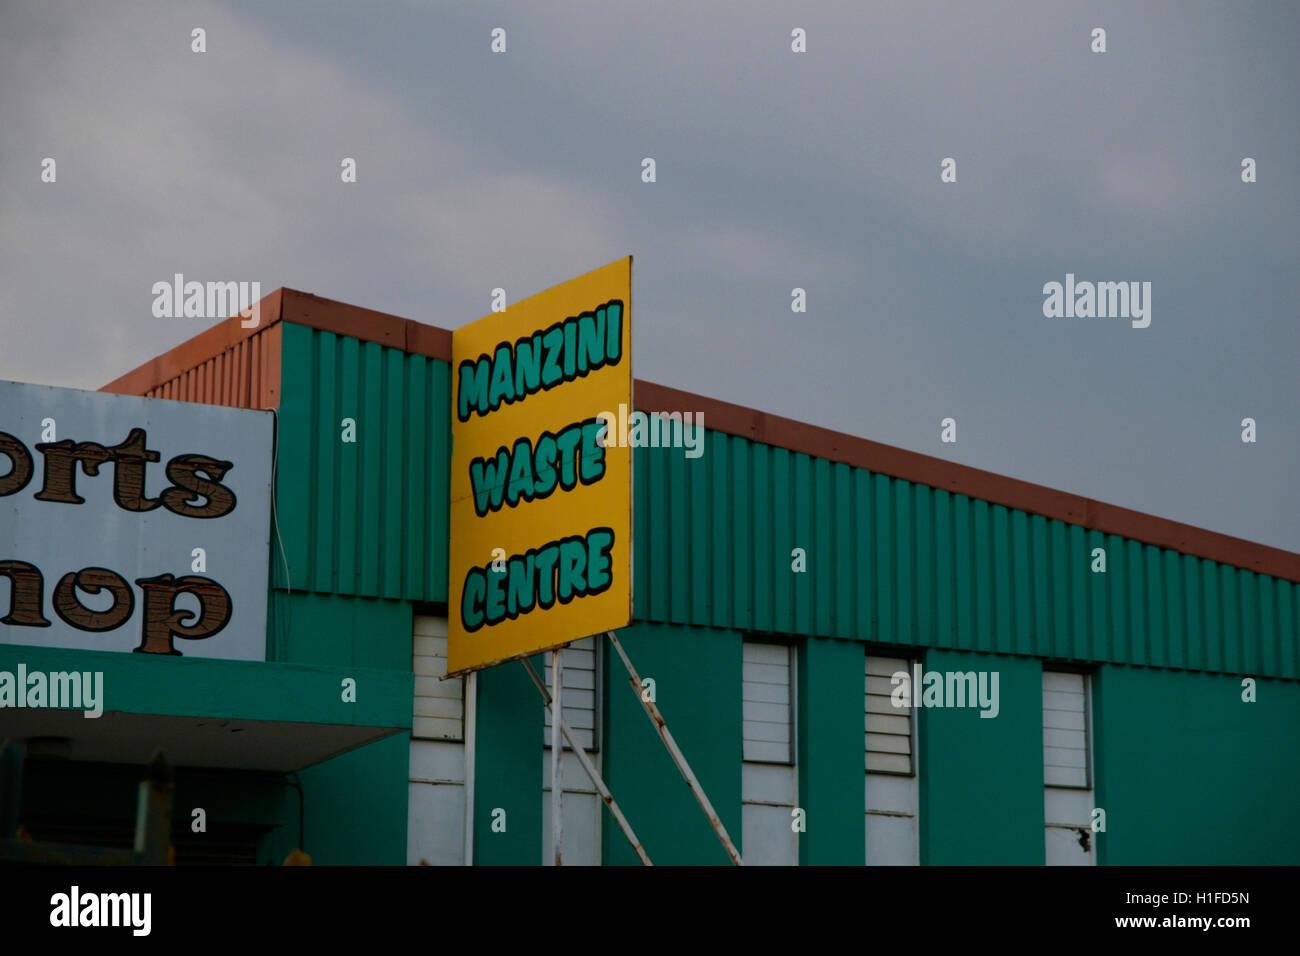 Manzini waste centre, Manzini, Kingdom of Swaziland - Stock Image